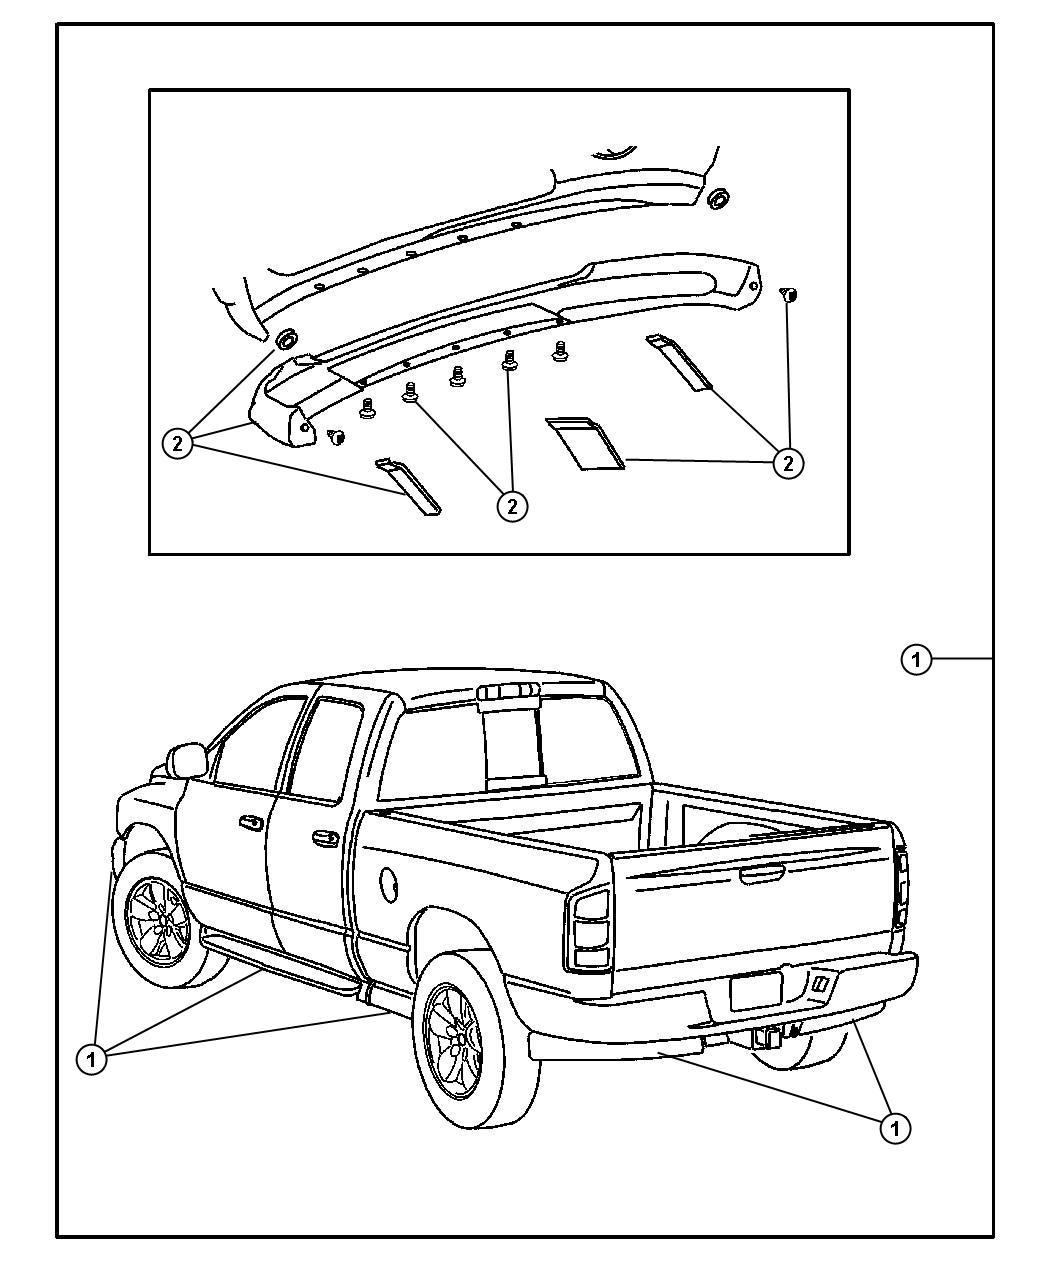 2003 Pt Cruiser Power Steering Diagram